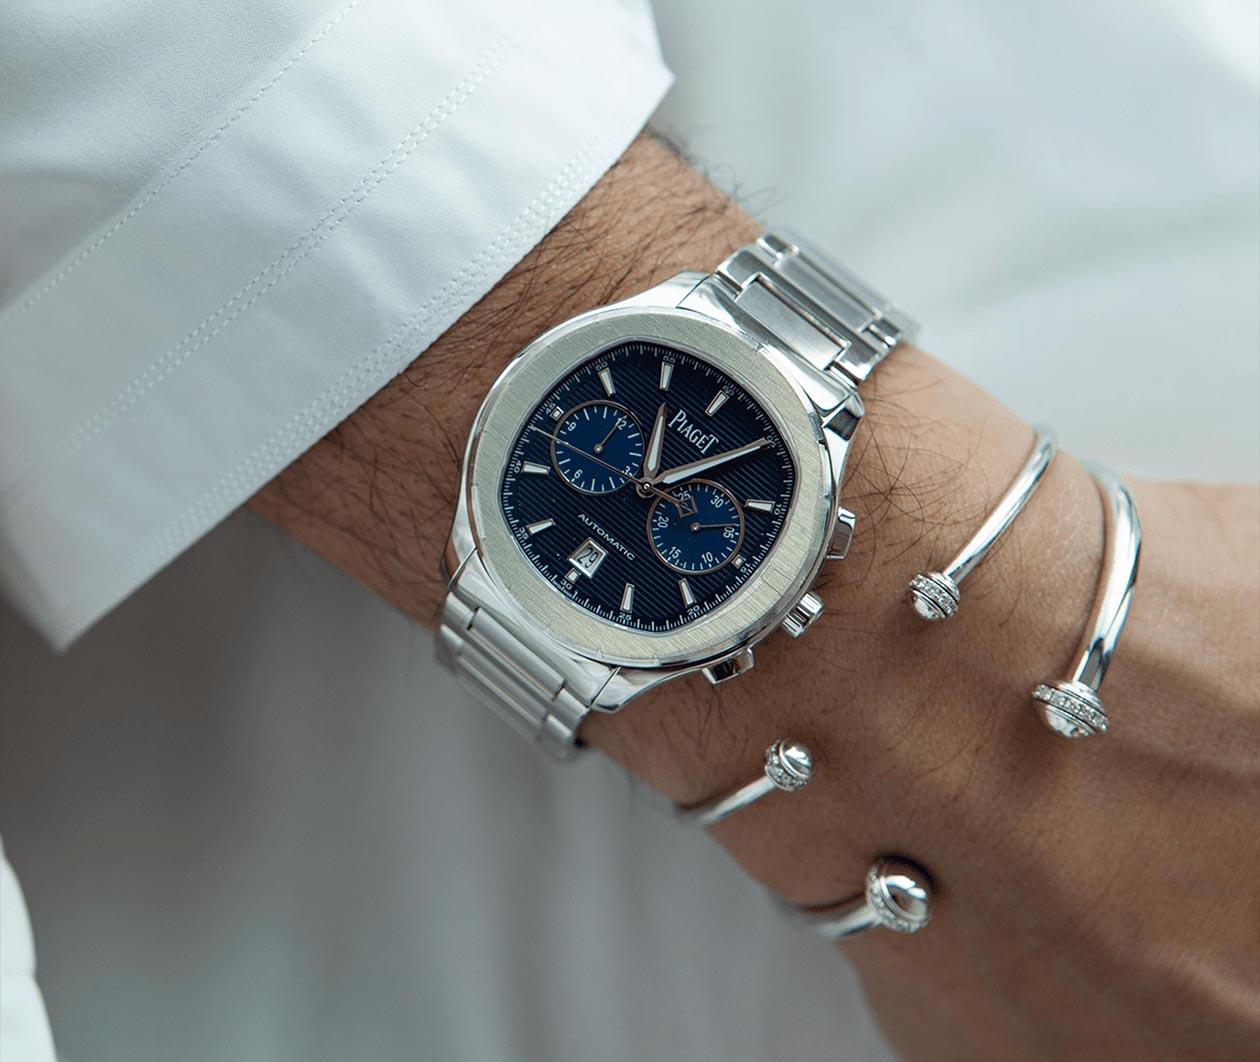 Piaget Polo watch G0A41006 Carousel 3 FINAL